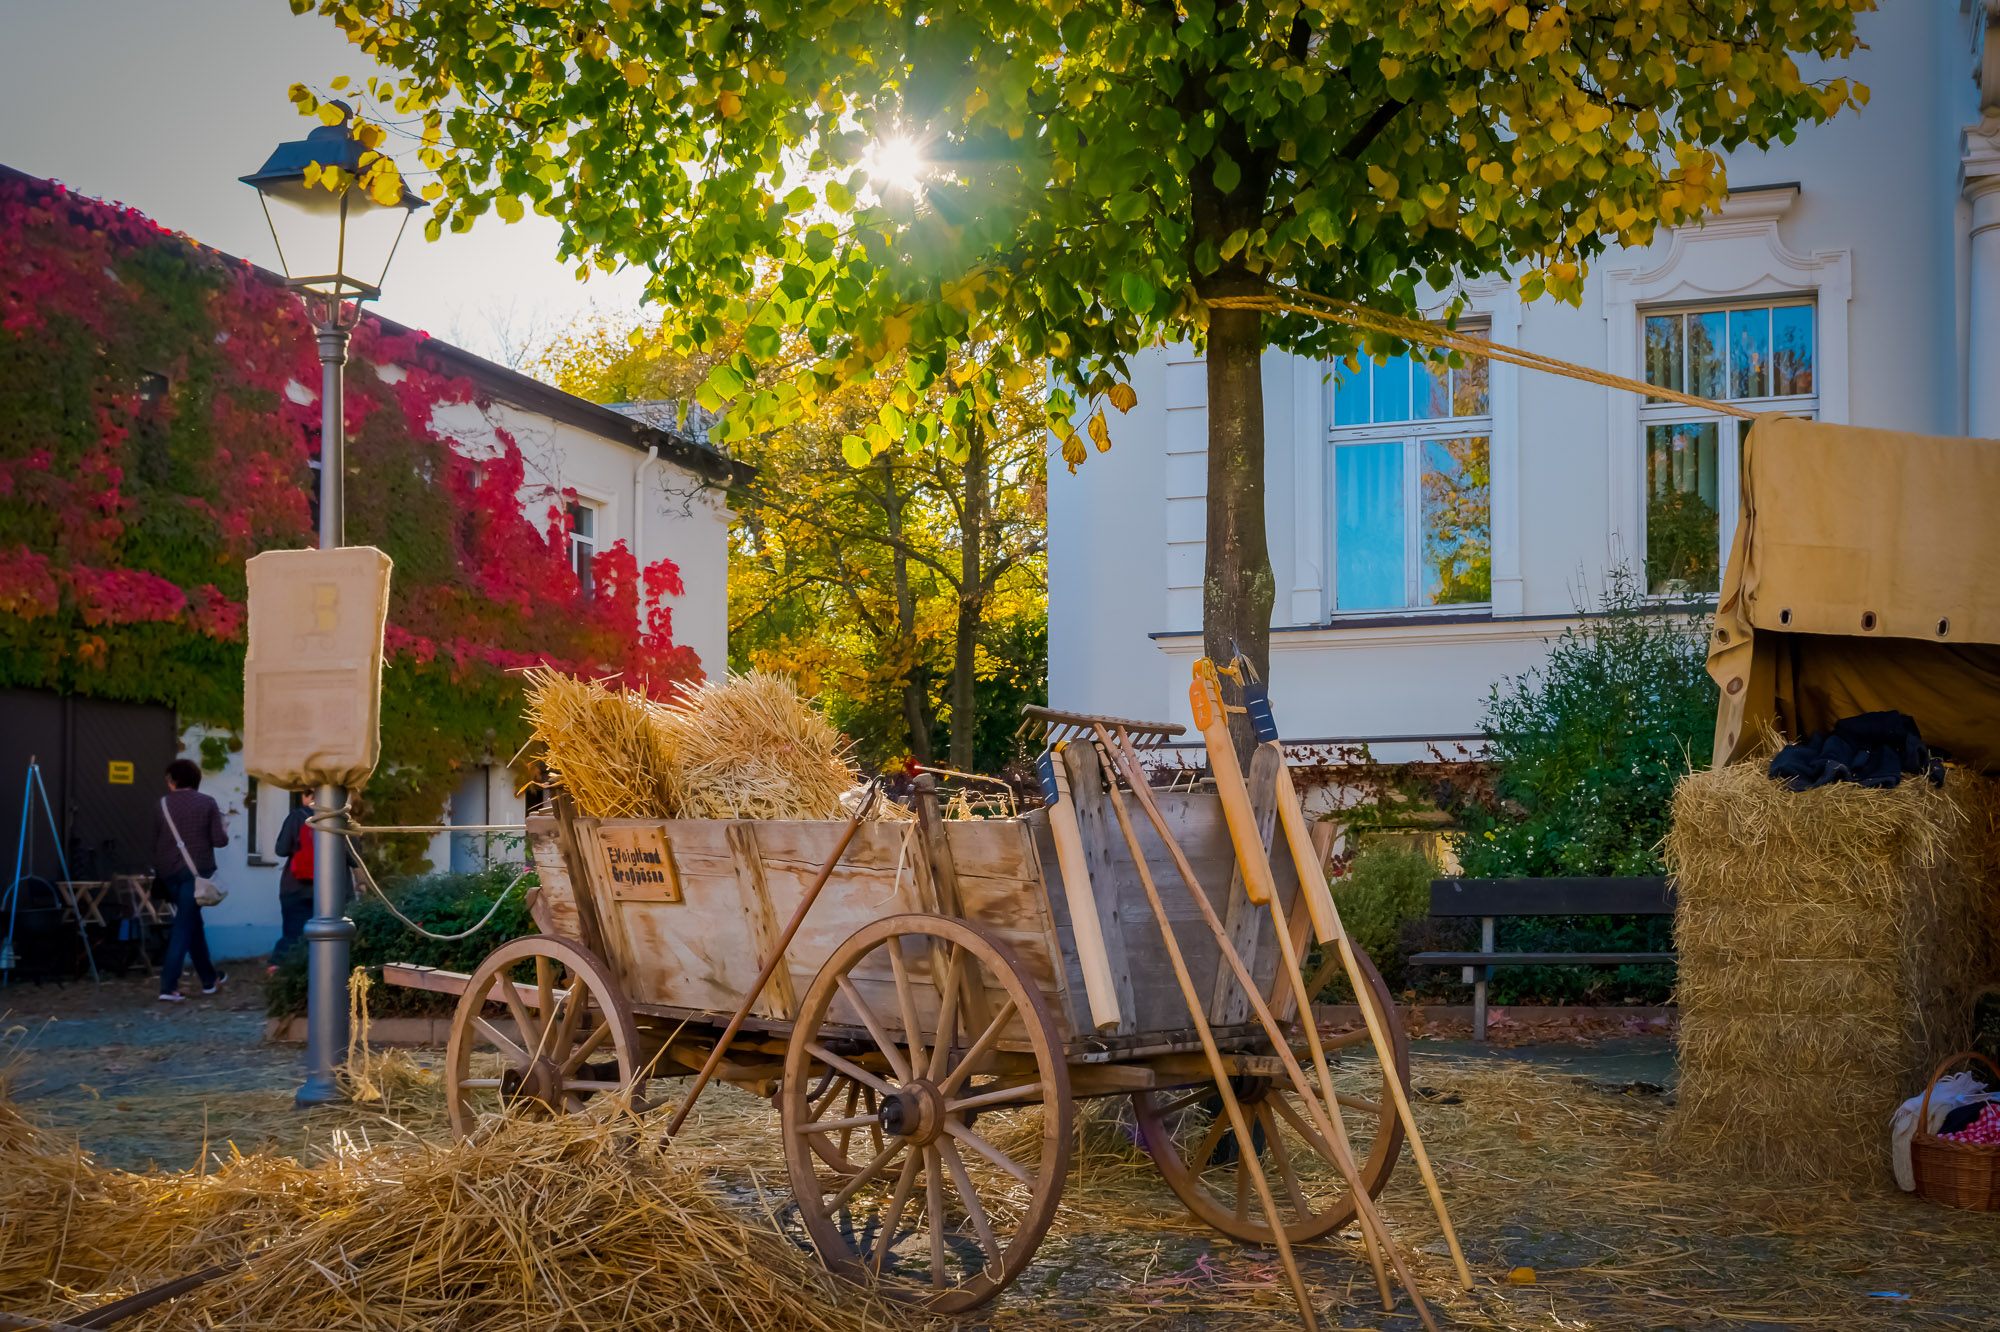 Bild/Foto: Sven Götze